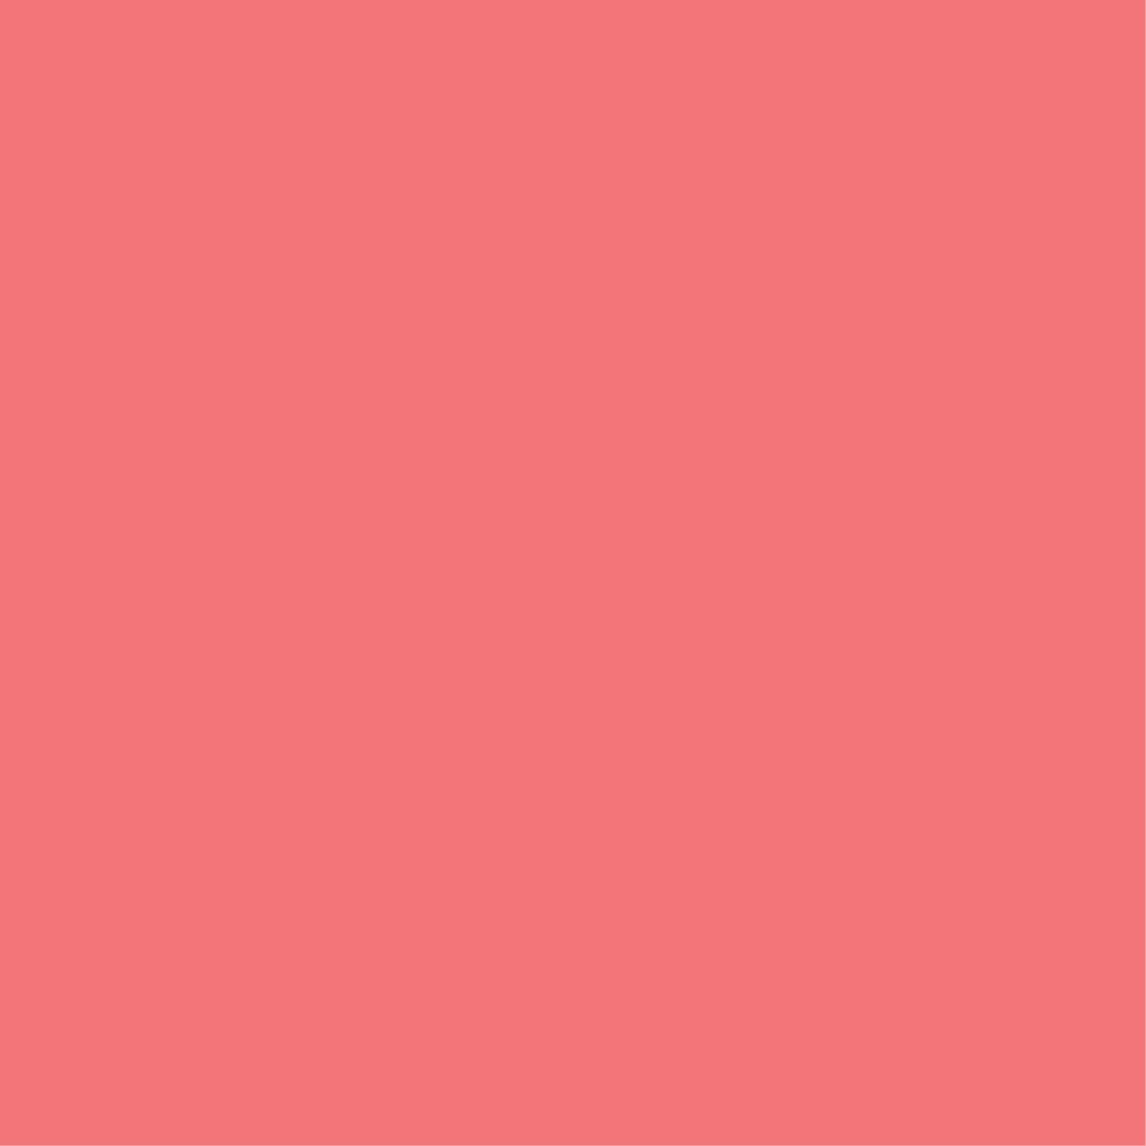 Pink - Coral 150gsm